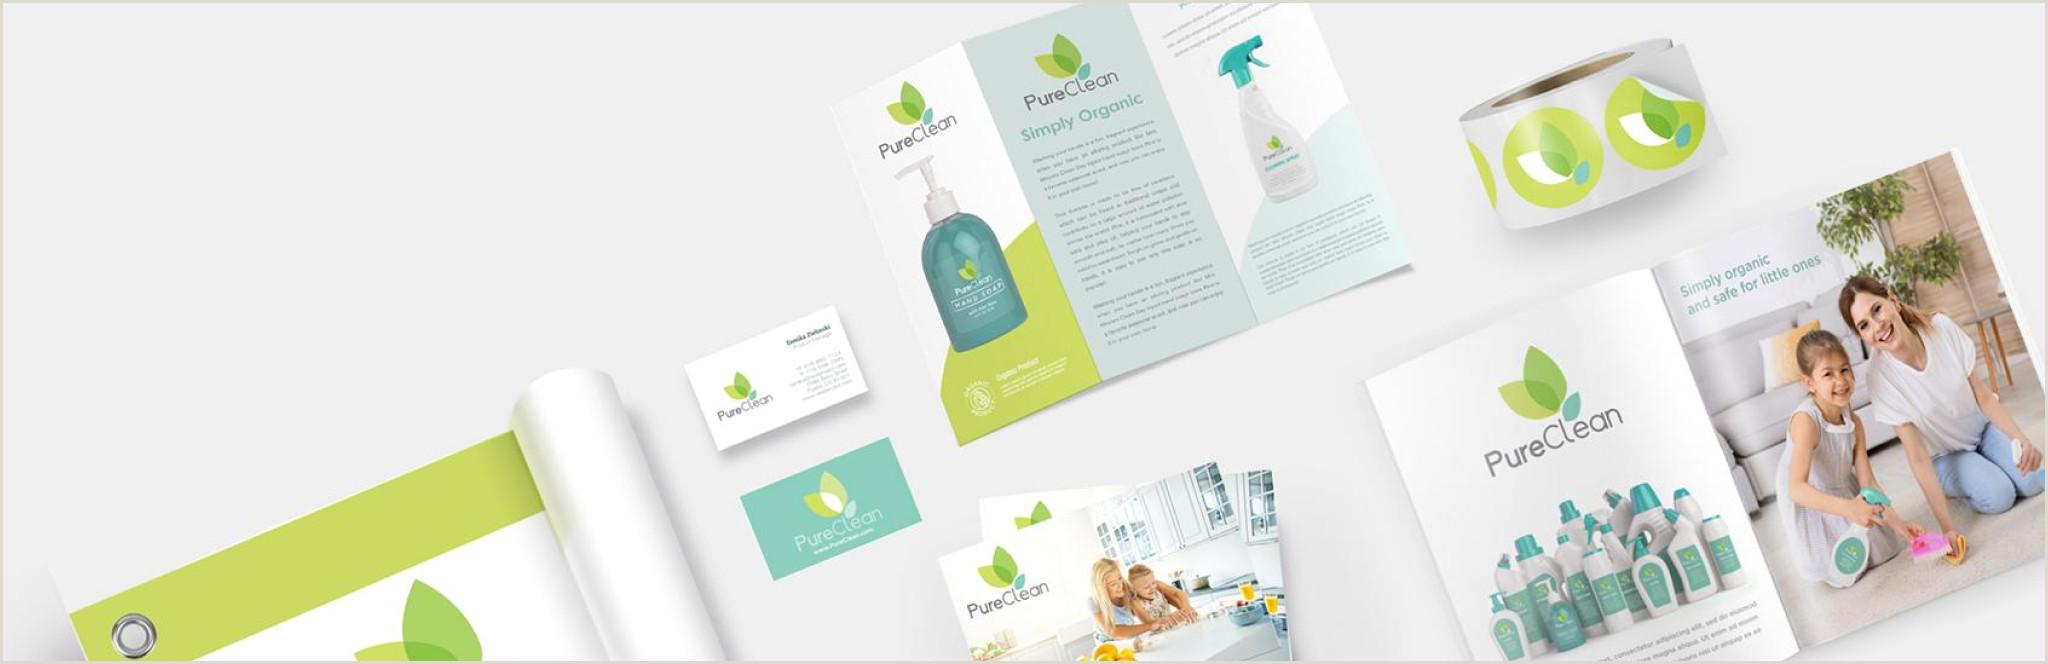 Business Cards Unique Designs Printplace High Quality Line Printing Services